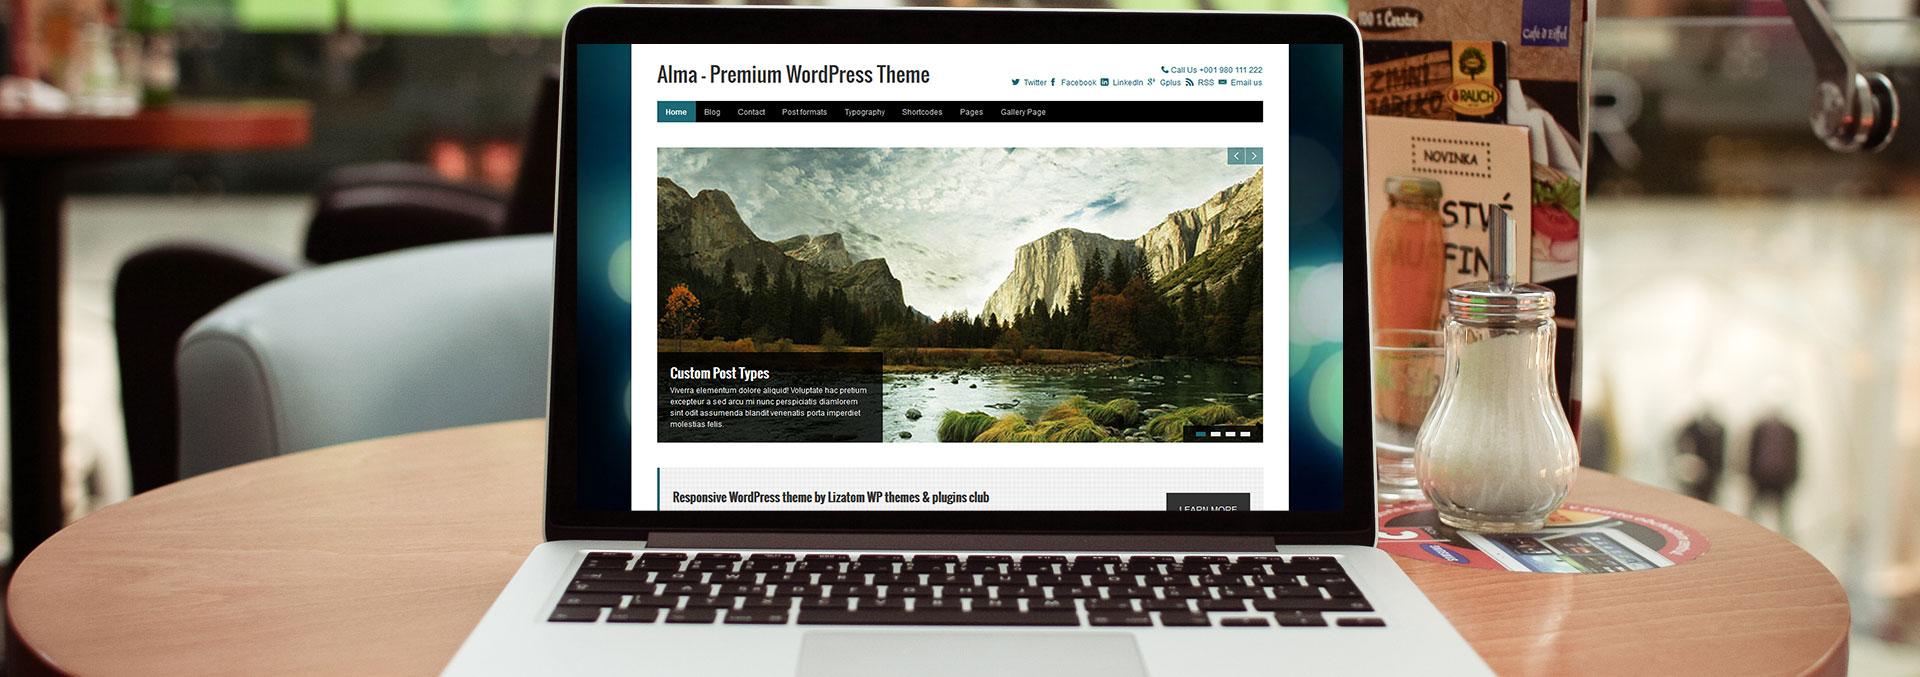 Alma wordpress theme